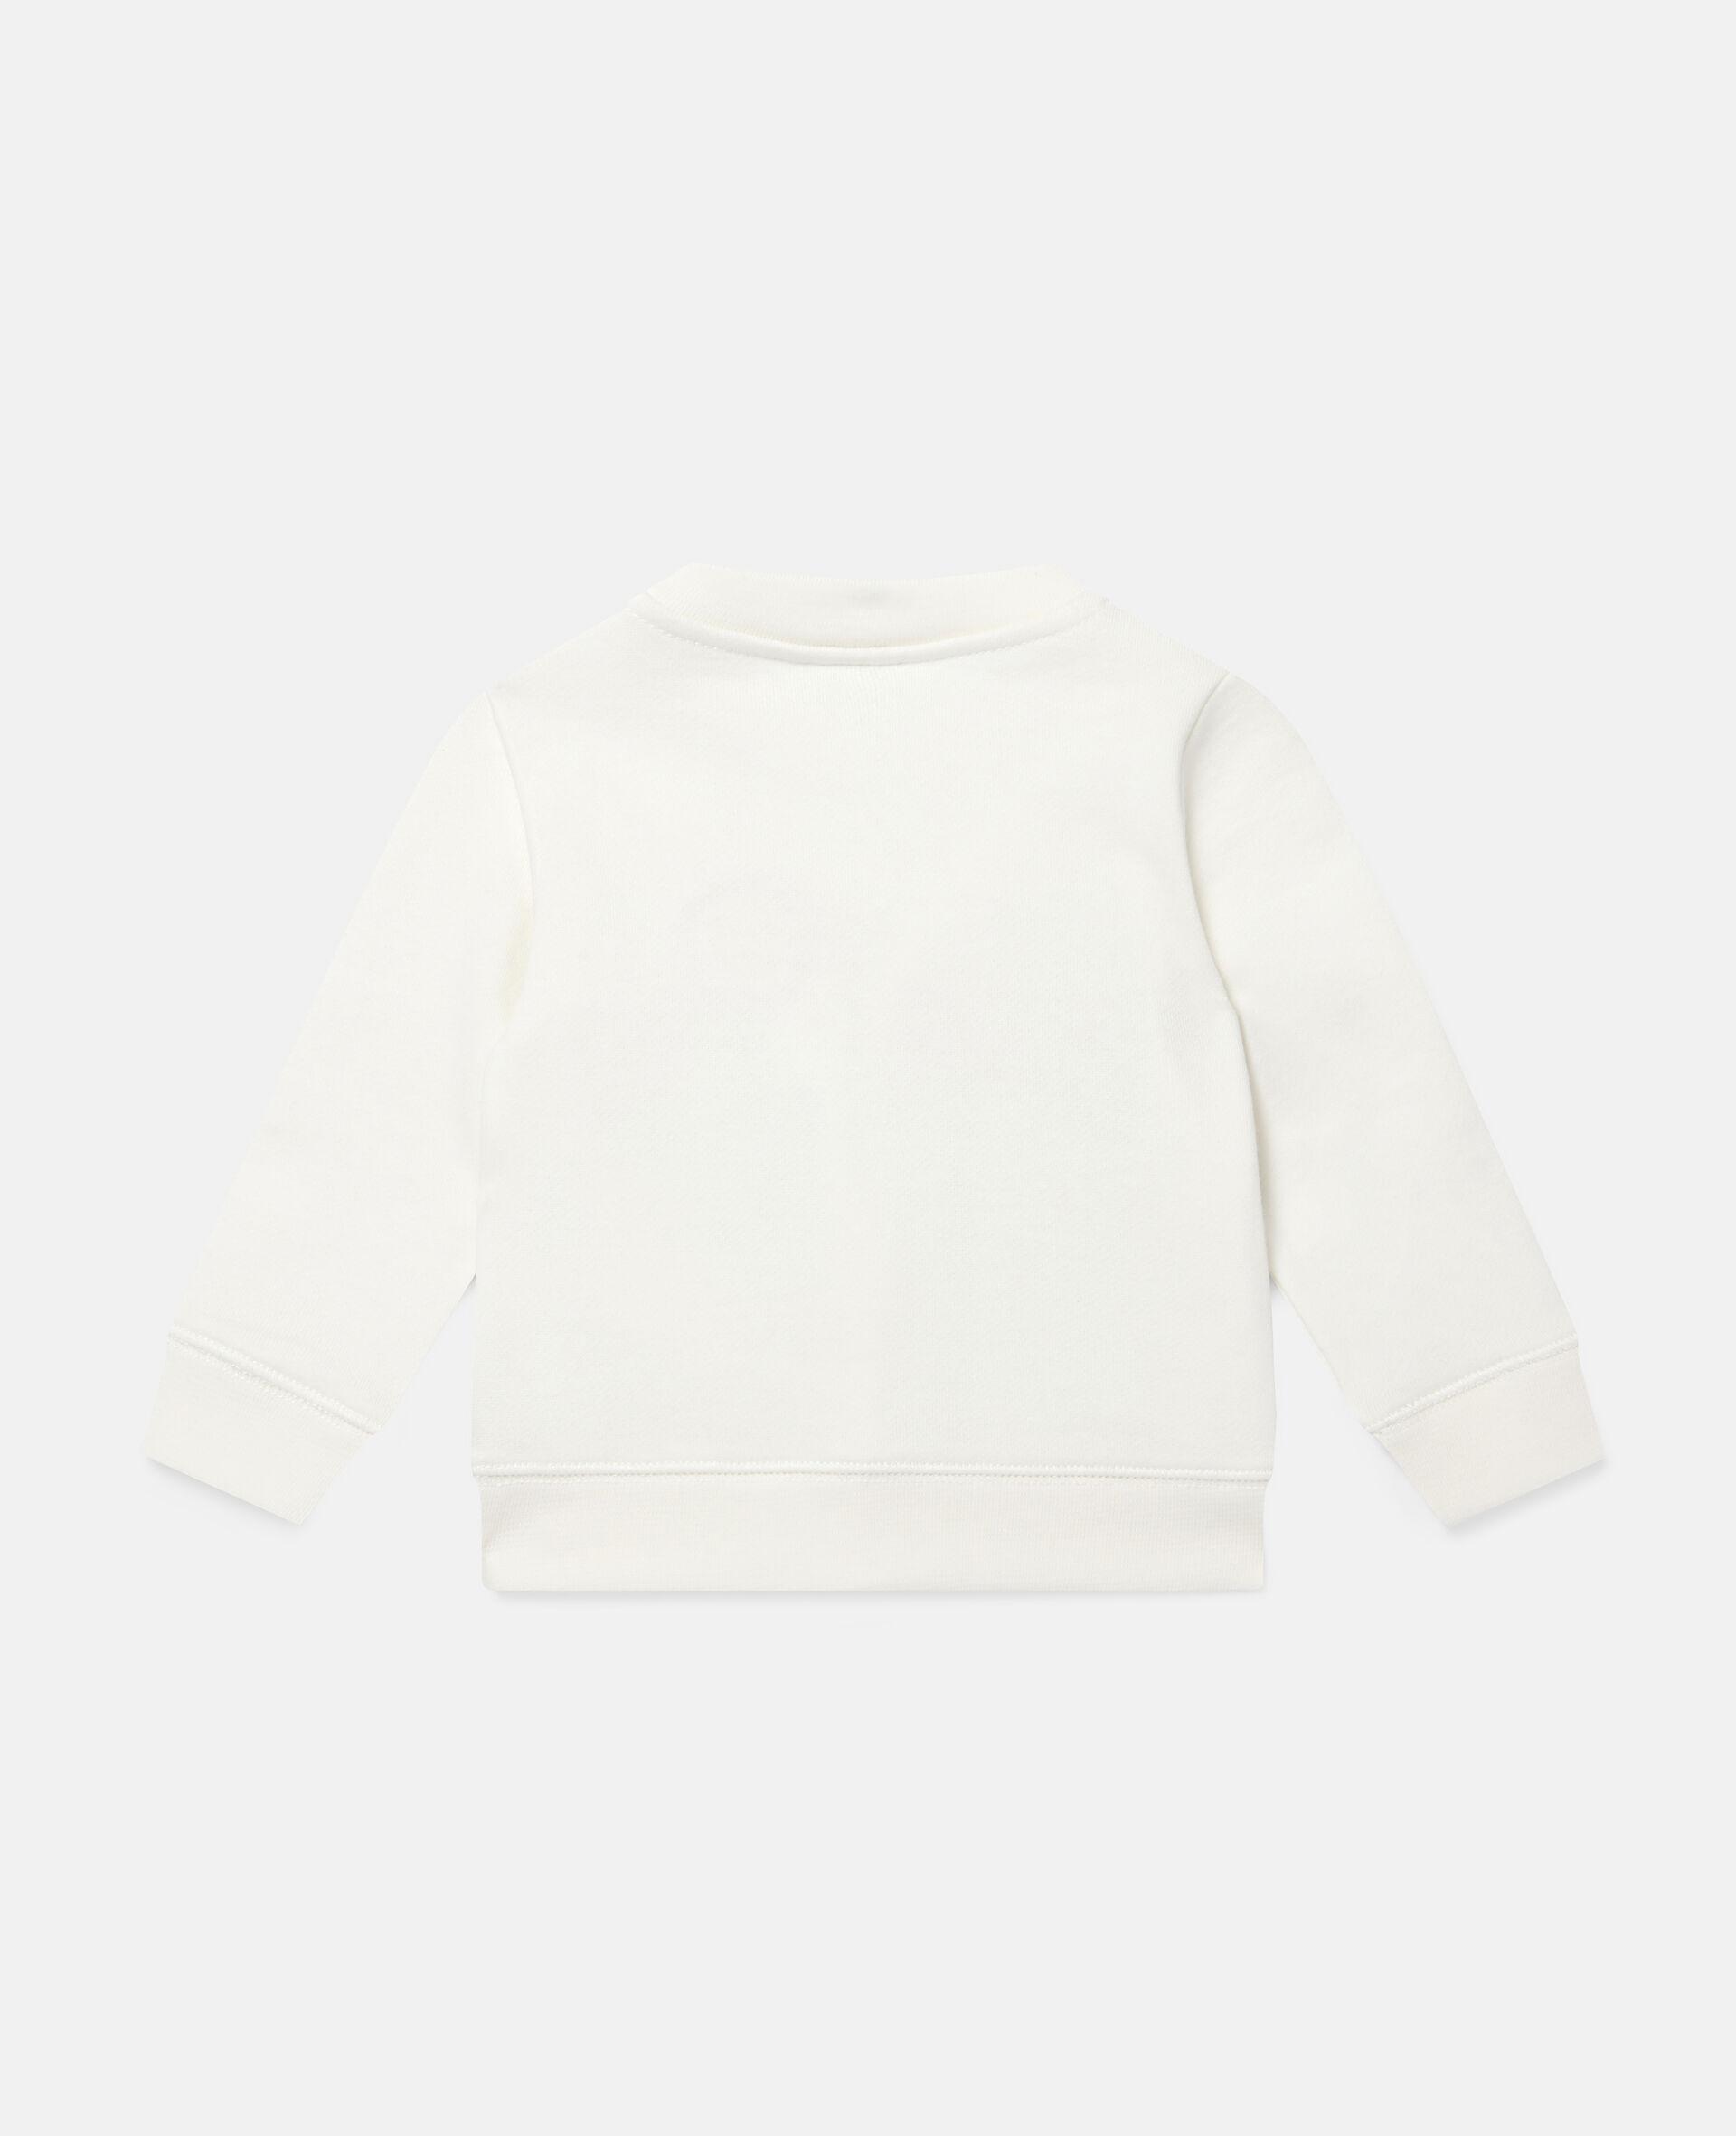 Embroidered Garden Fleece Sweatshirt-White-large image number 3